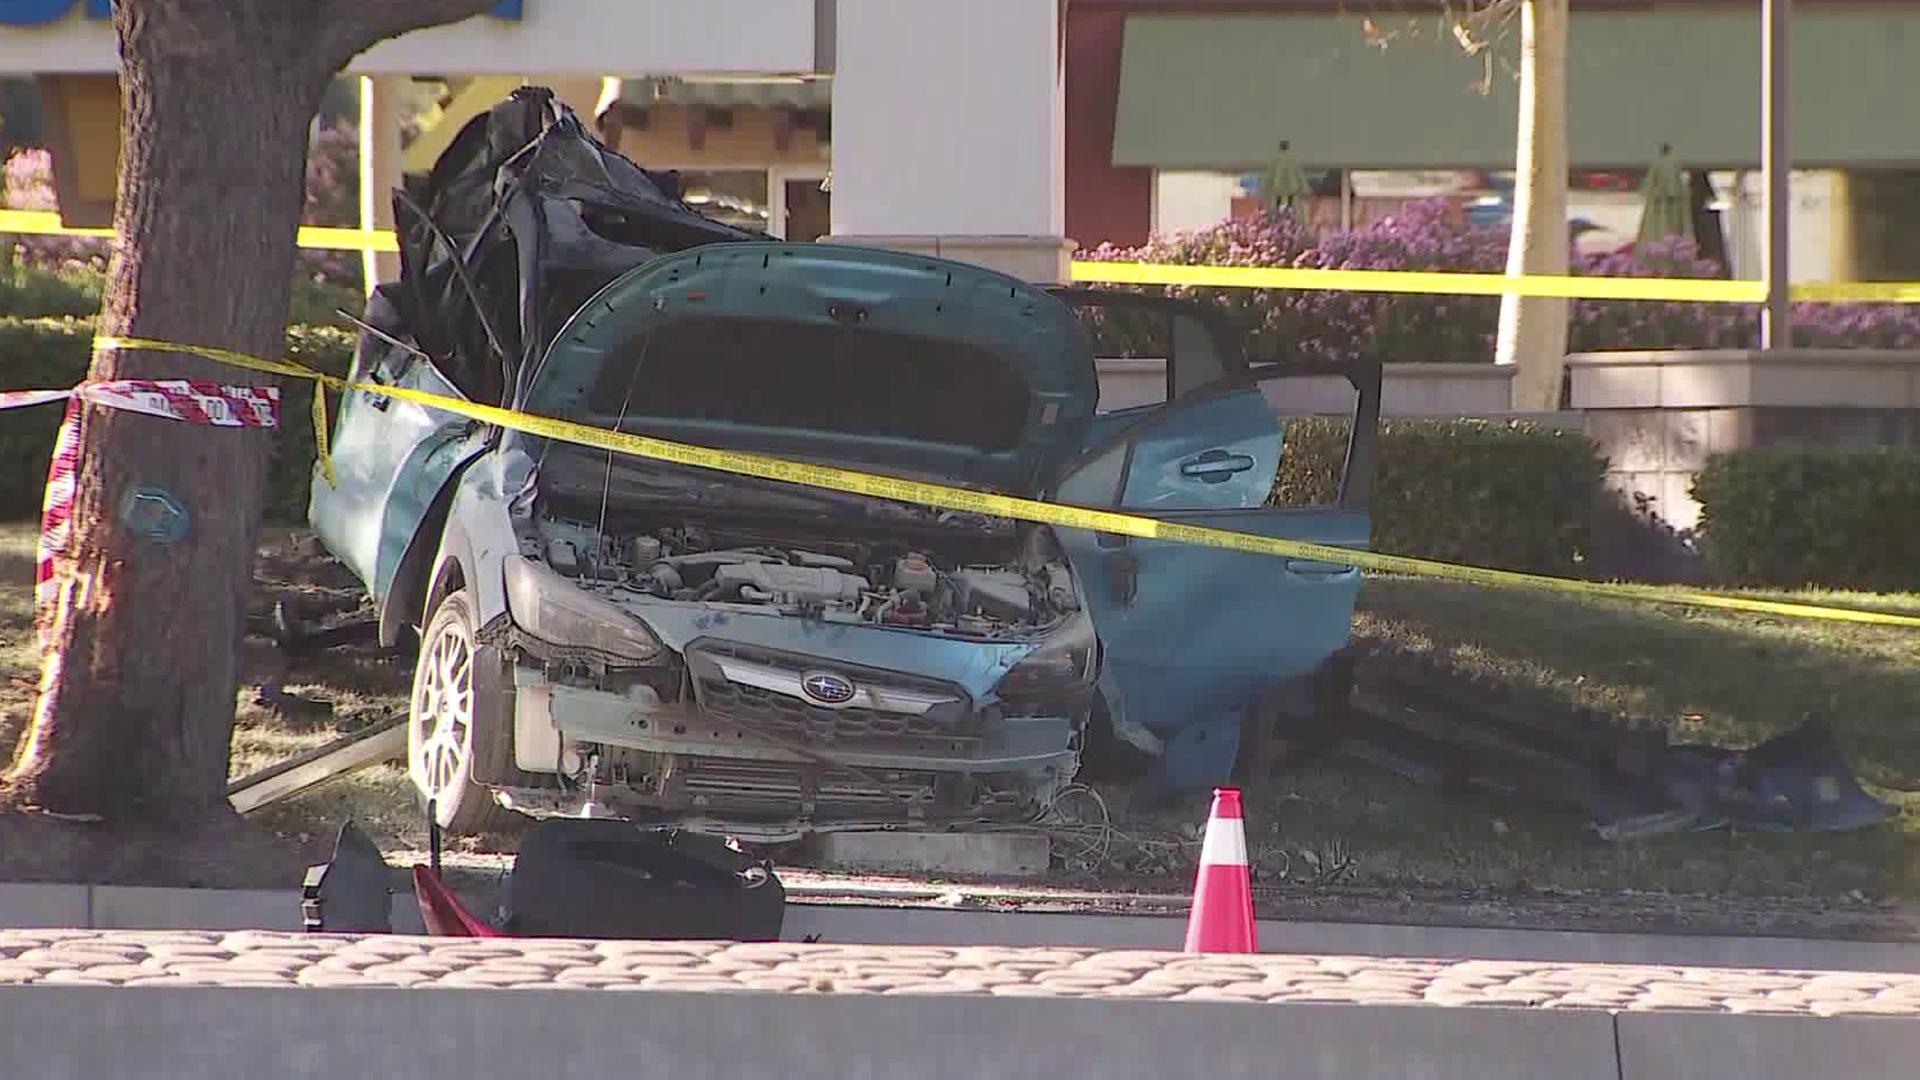 A car involved in a fatal crash in the Stevenson Ranch area is seen on Nov. 18, 2019. (credit: KTLA)